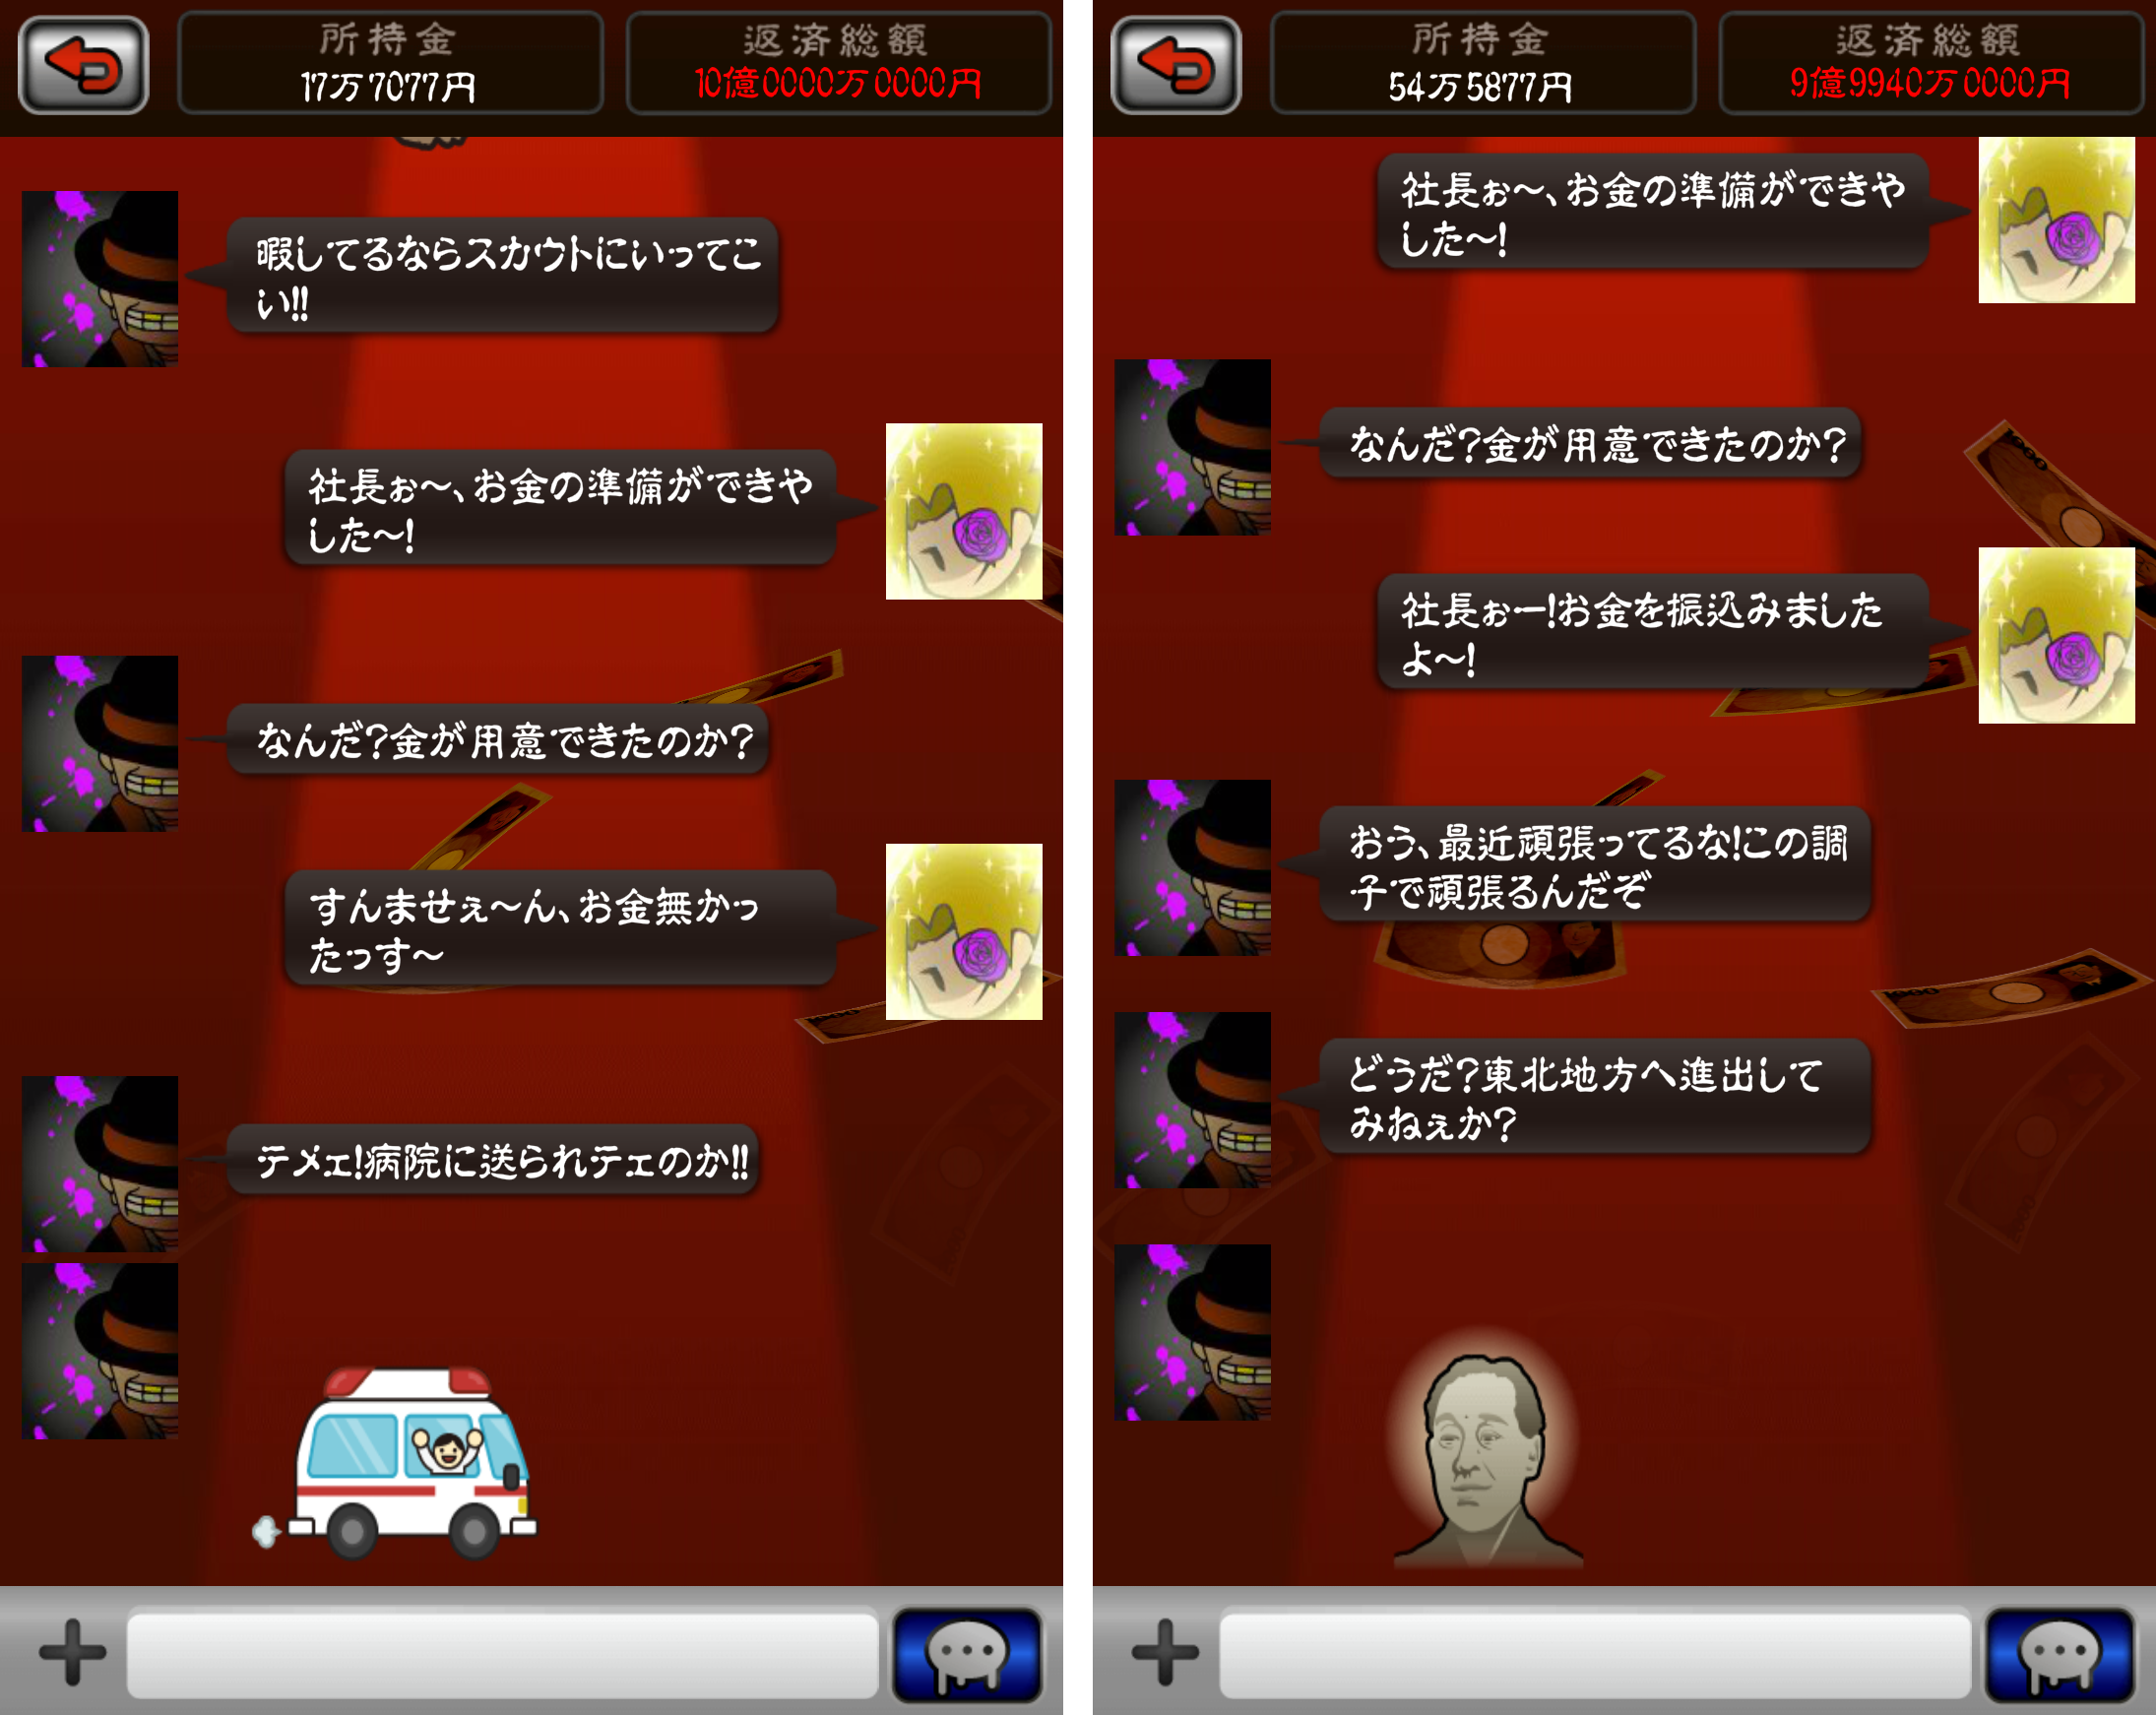 androidアプリ ニコニコ交際倶楽部攻略スクリーンショット7